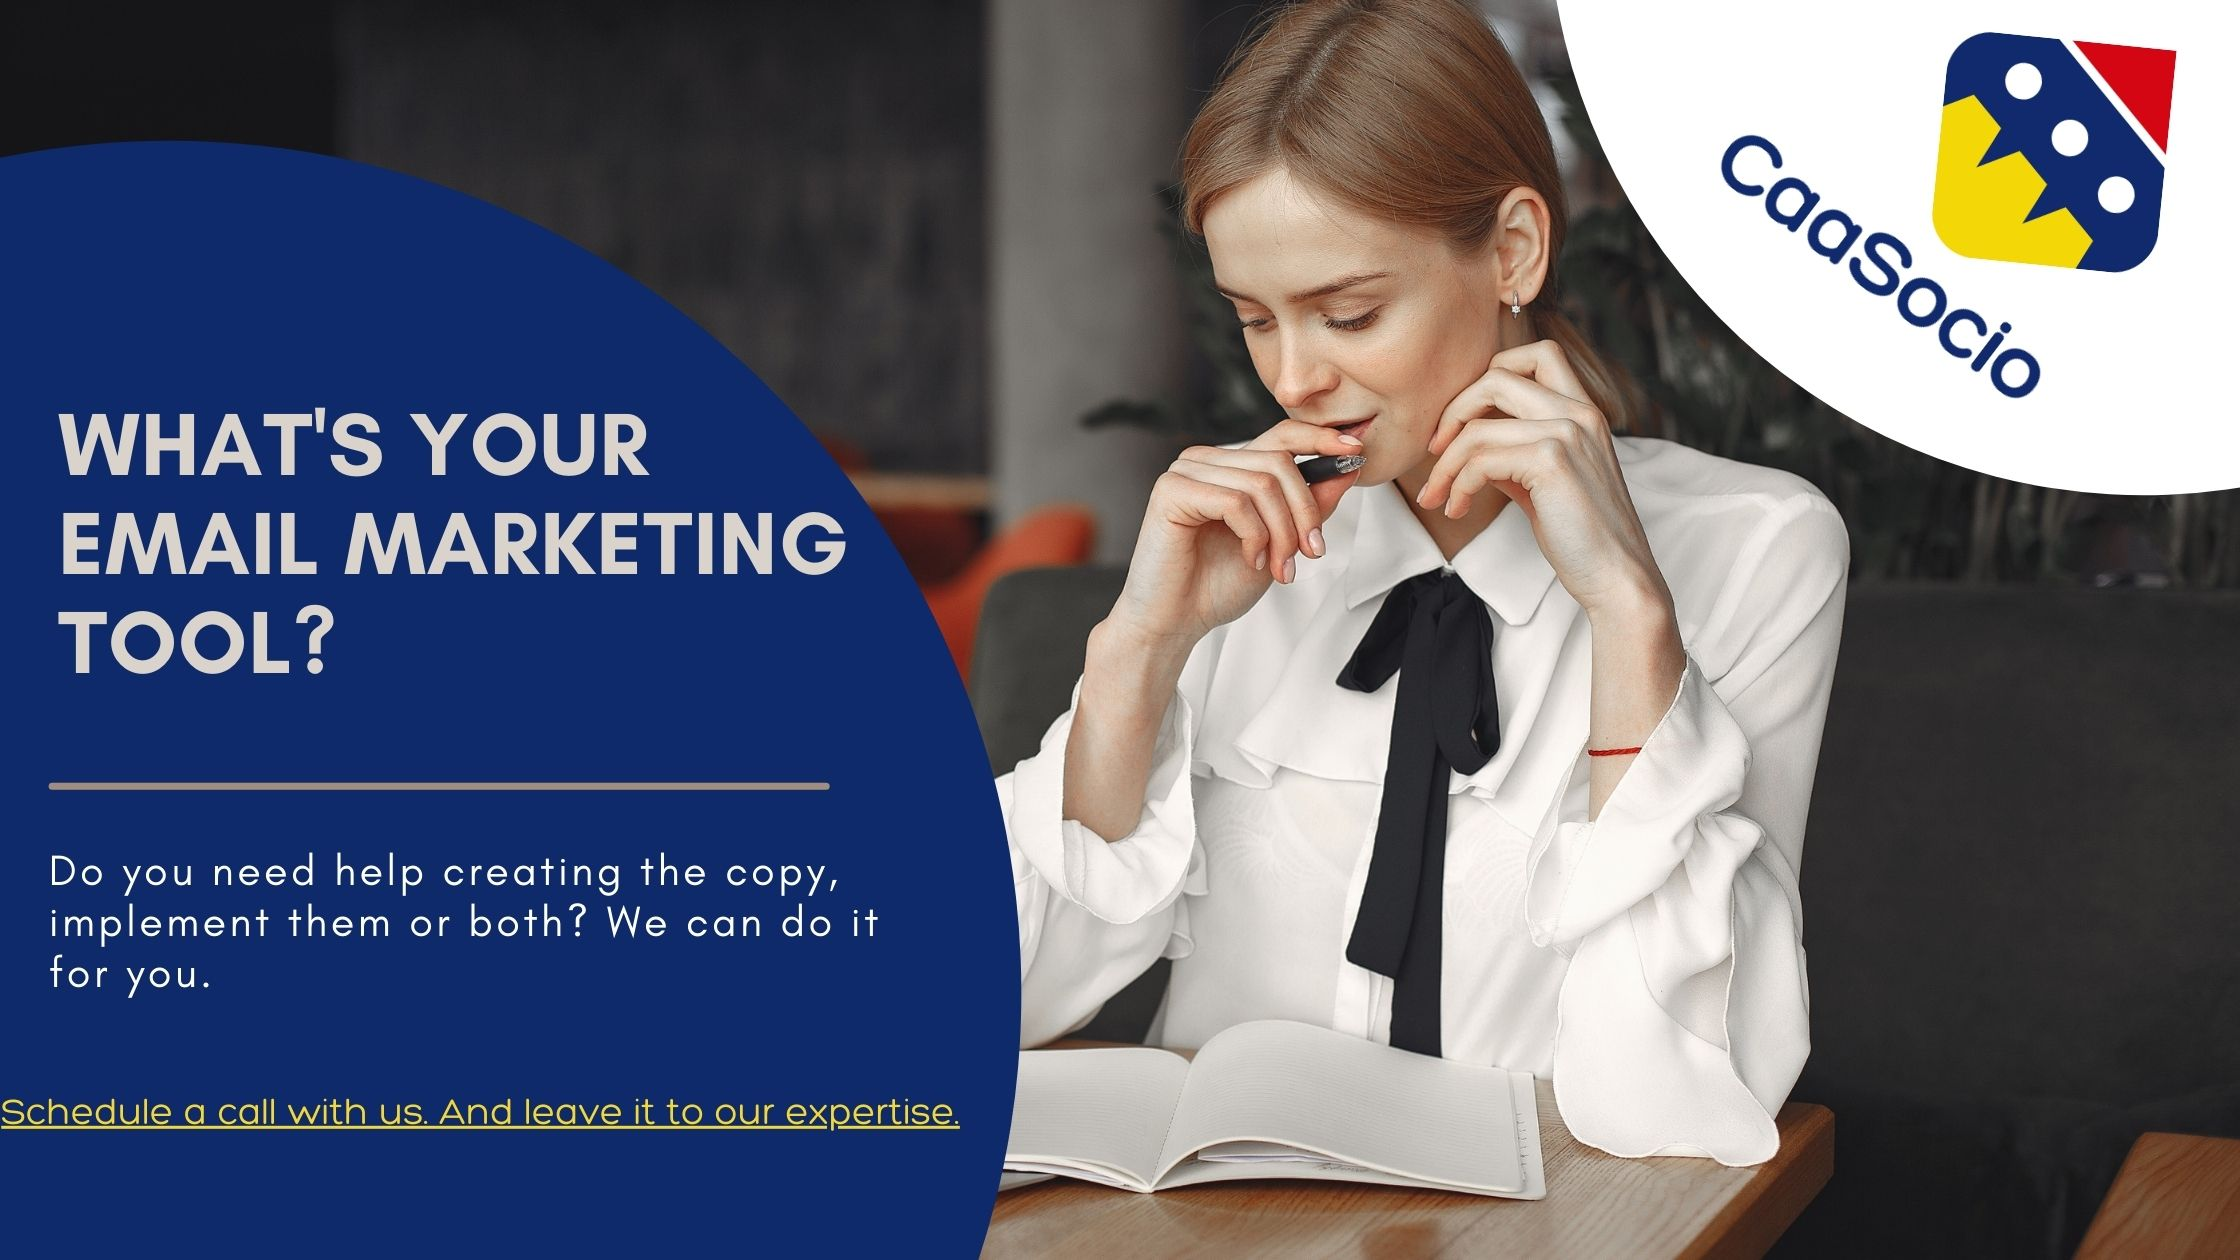 CaaSocio-BlogCTA-best-tools-for-email-marketing